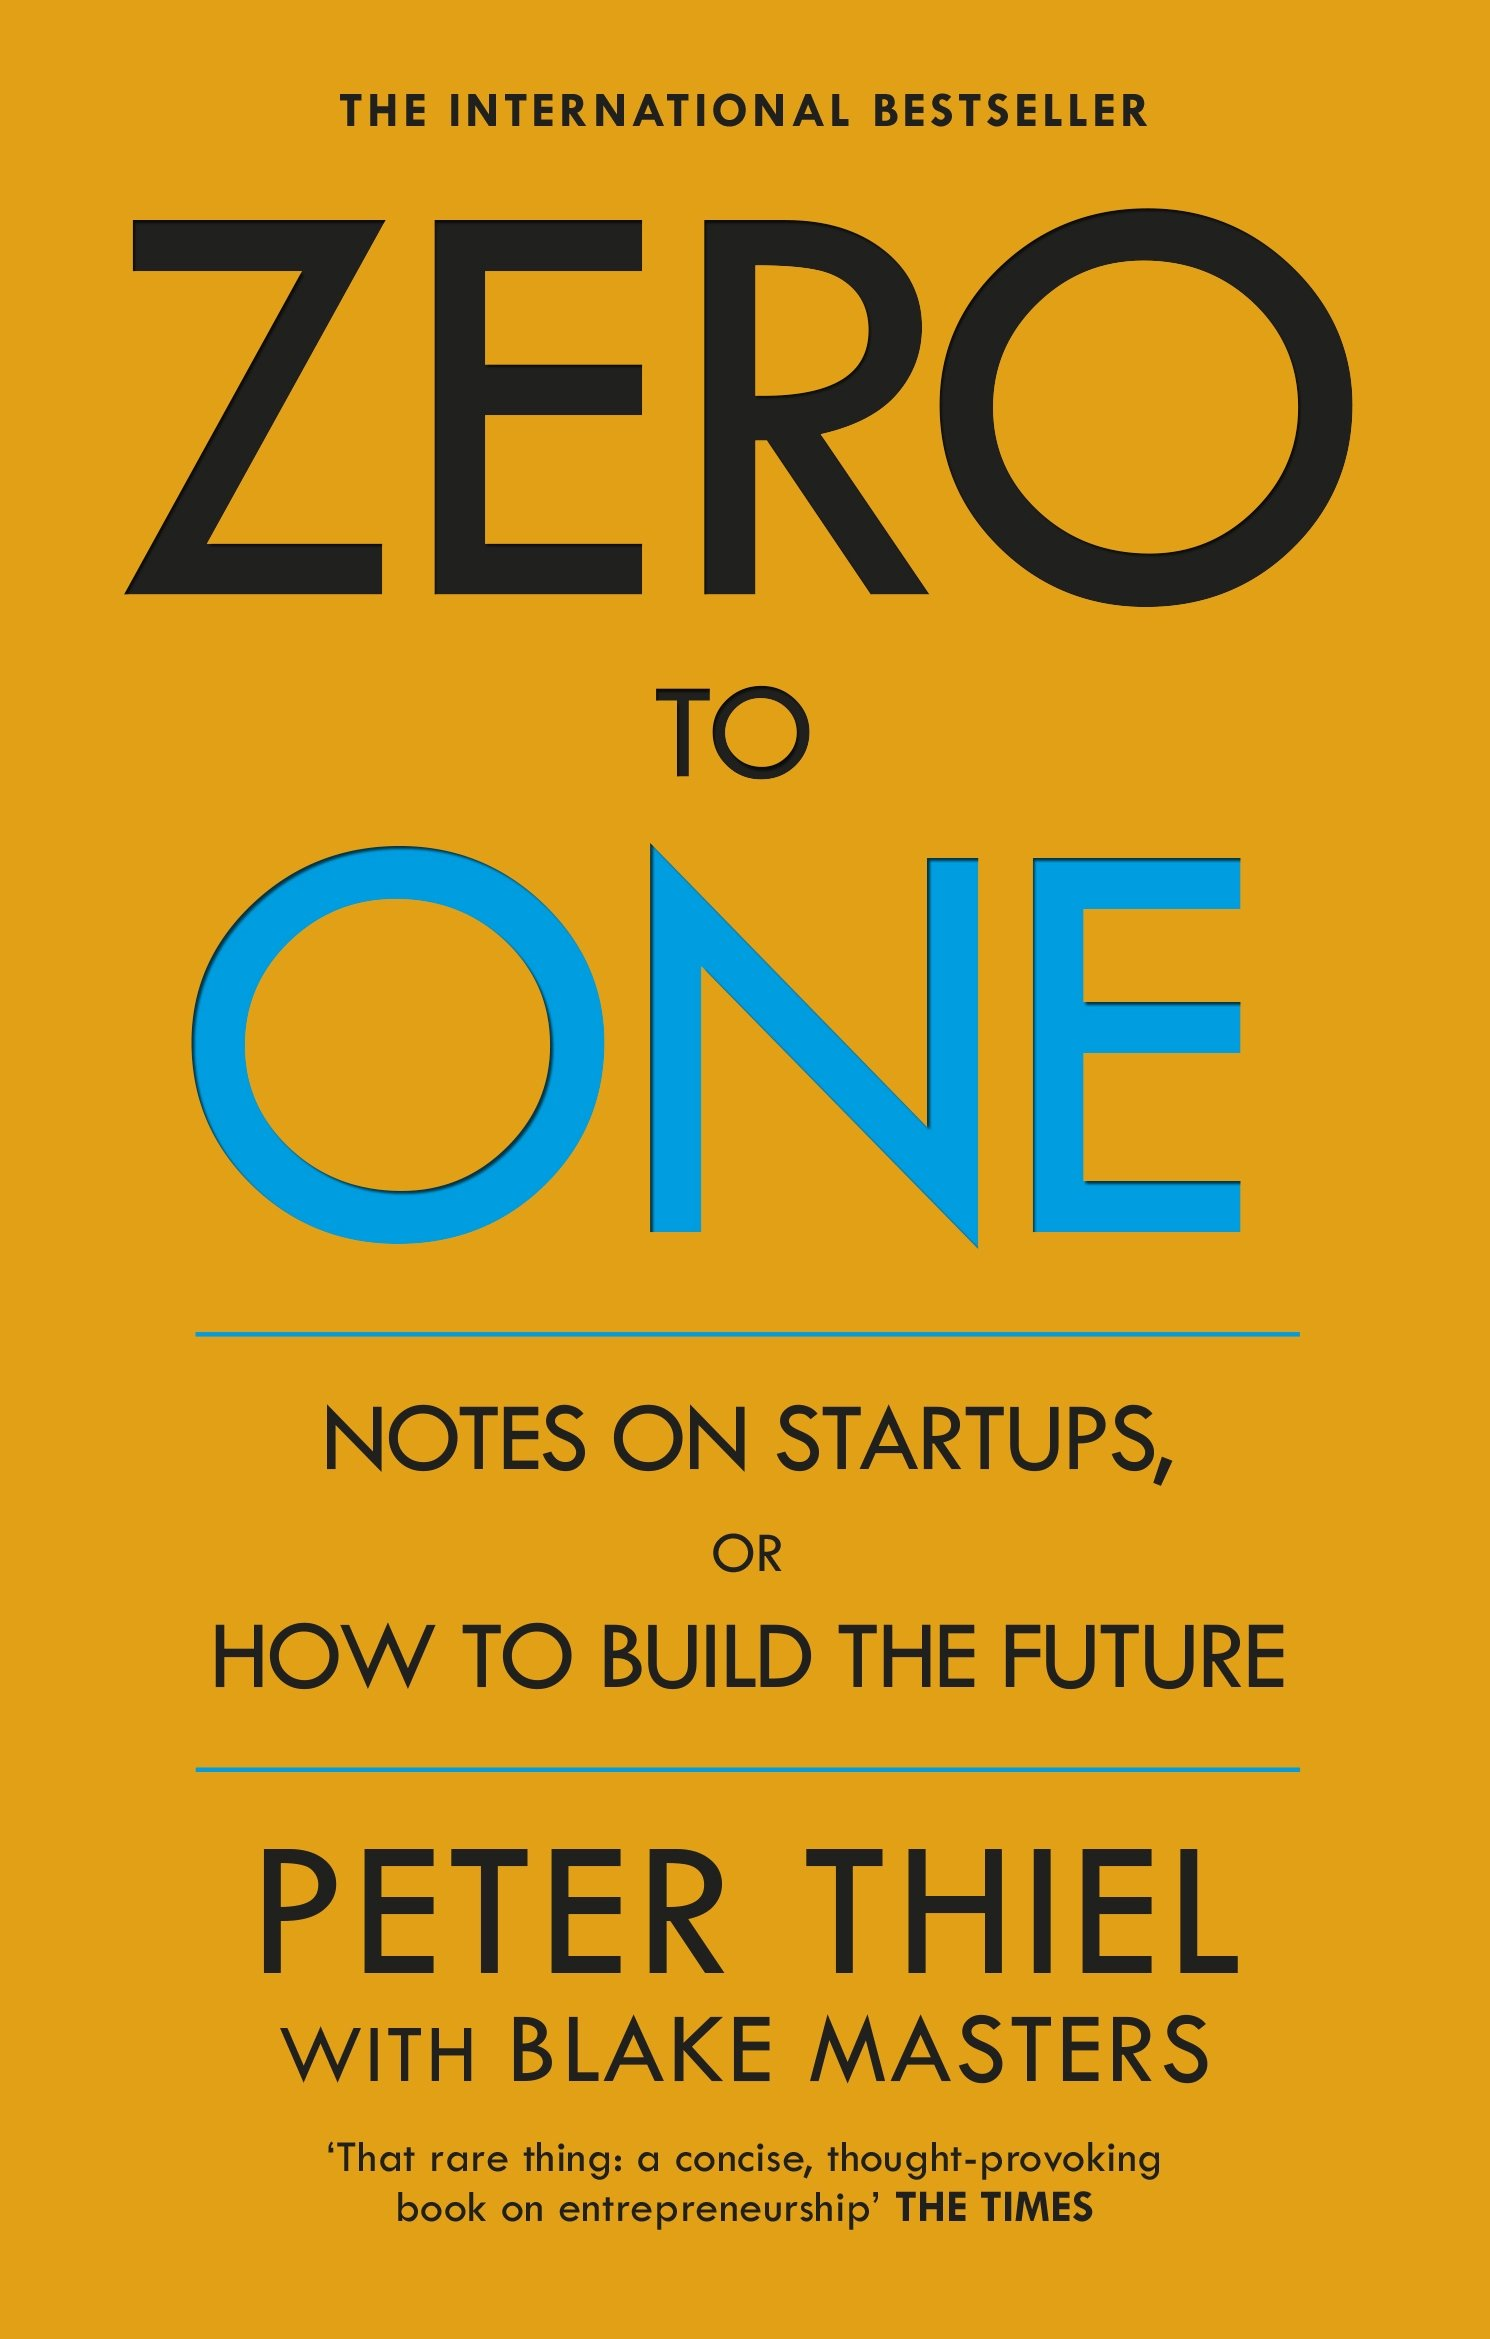 Peter Thiel(2015)『Zero to One』Virgin Books